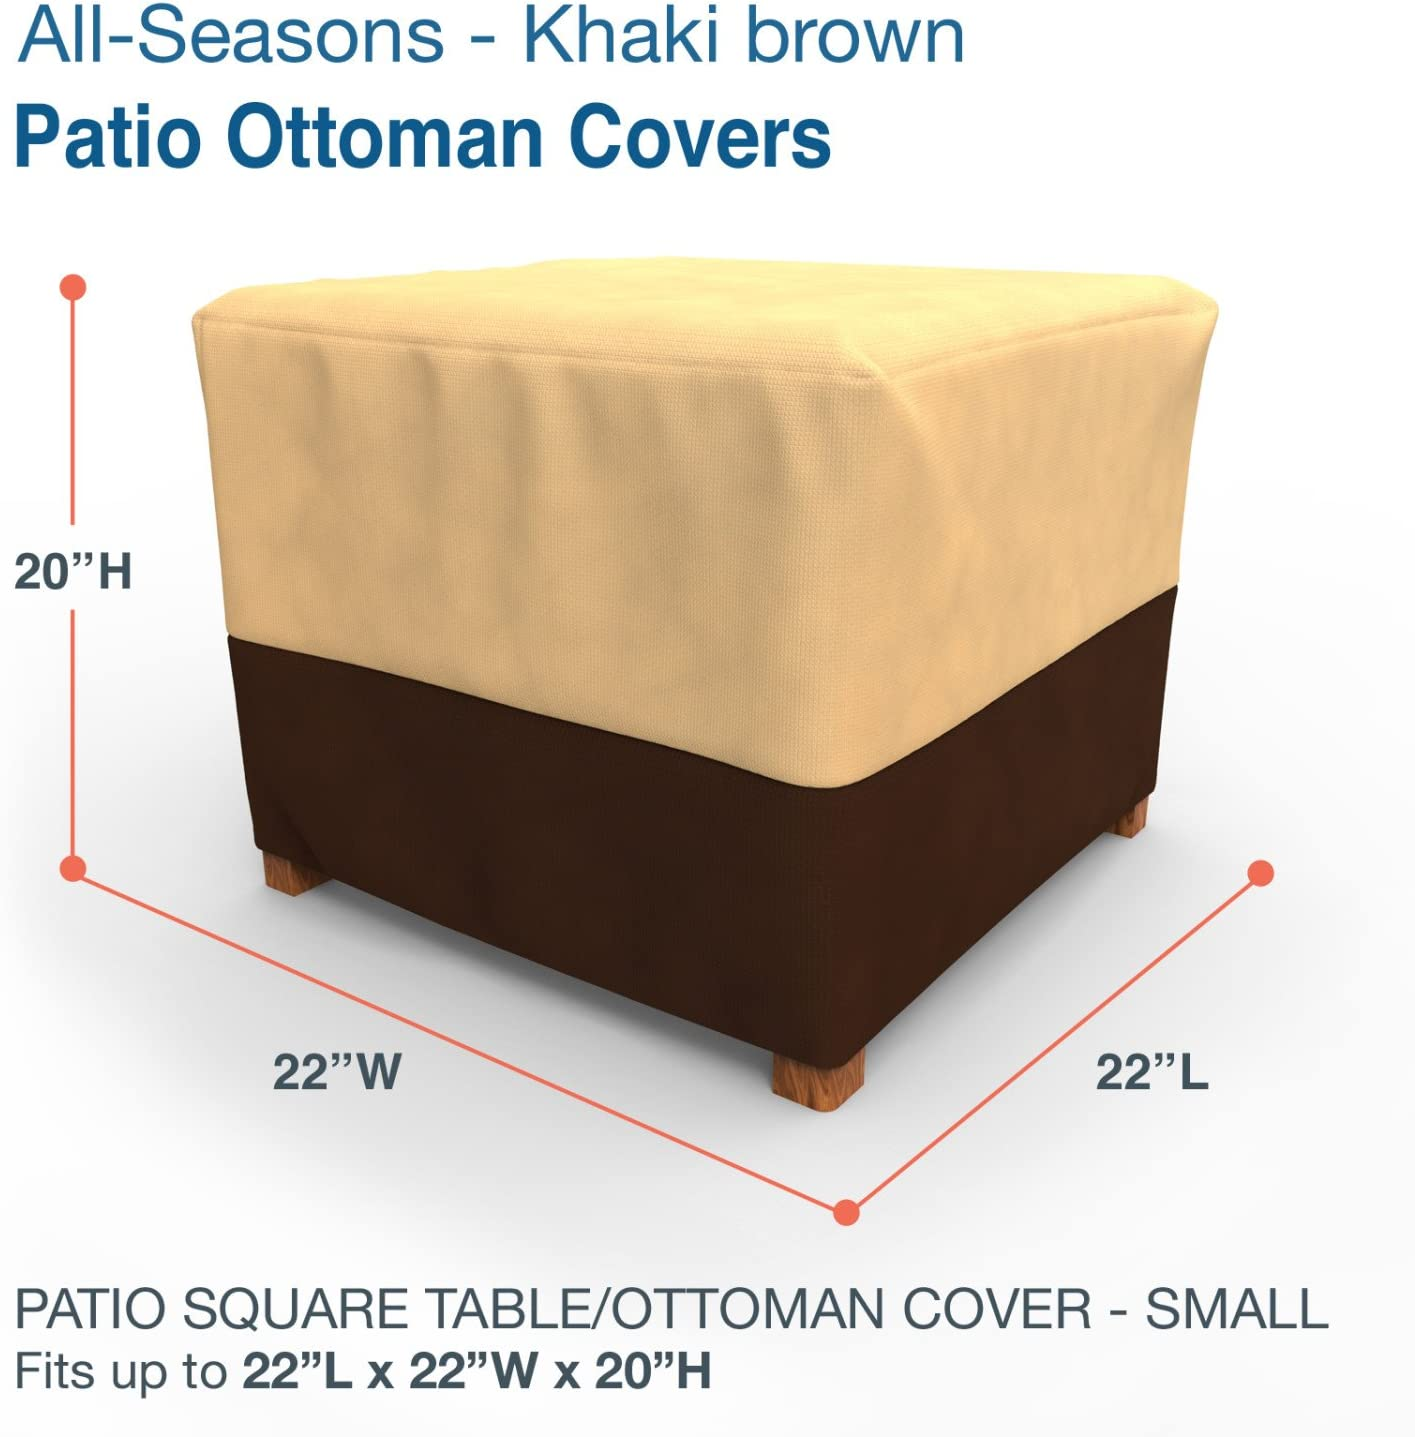 Amazon Com Budge P4a05kb1 All Seasons Table Cover Small Khaki Brown Garden Outdoor